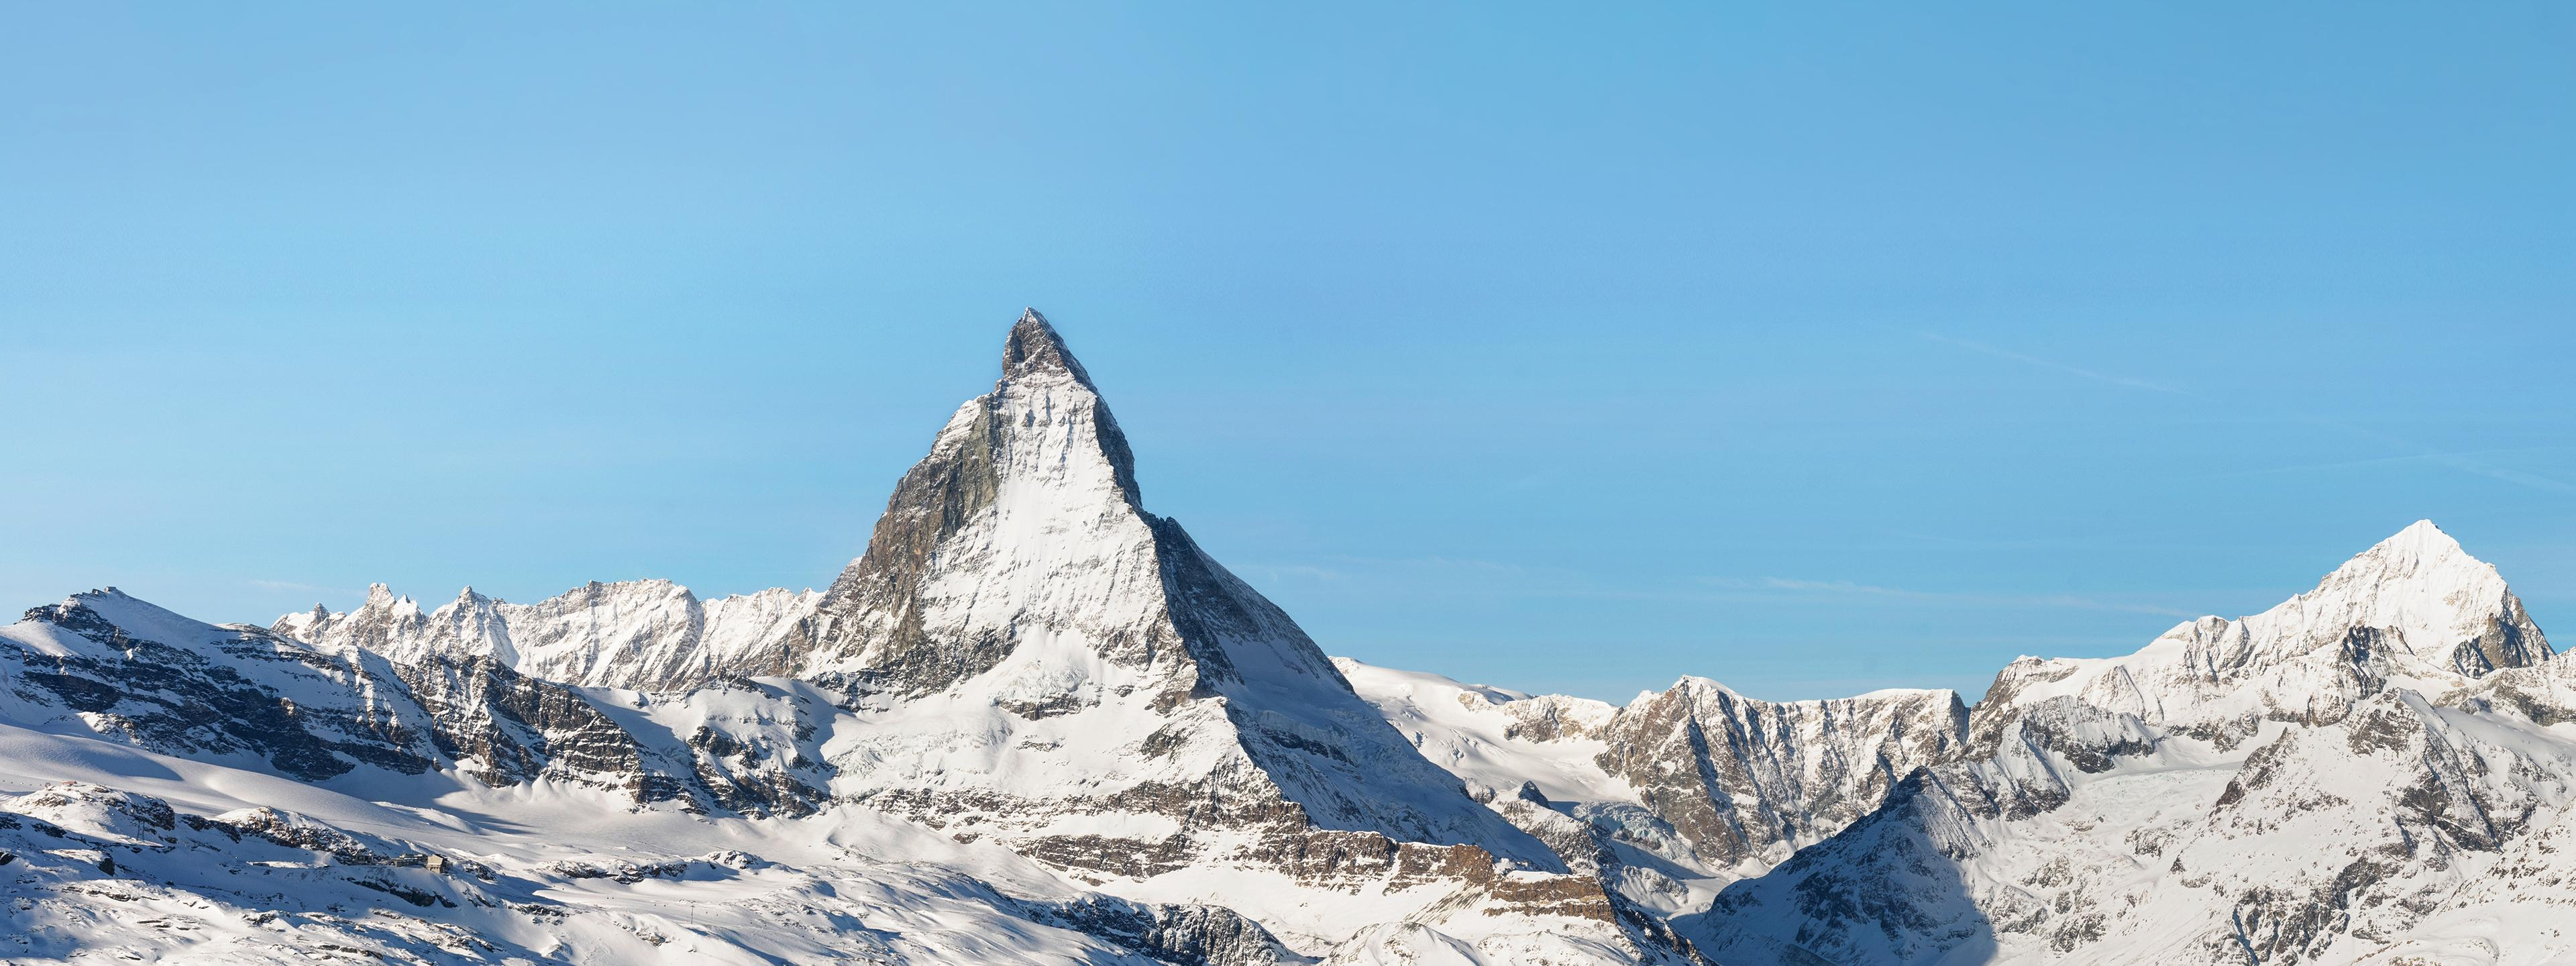 BRITA vision snowy mountaintop